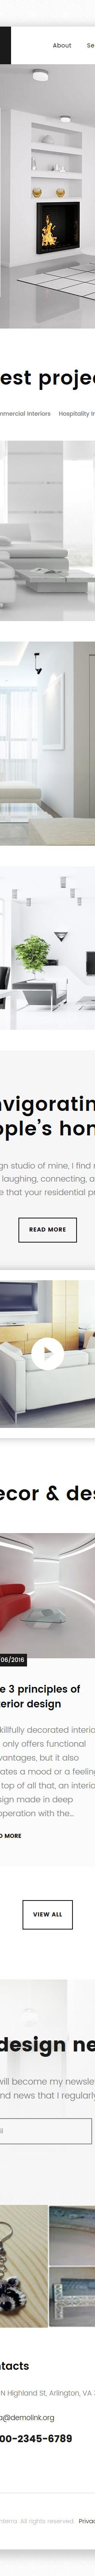 Interior Design Templates TemplateMonster